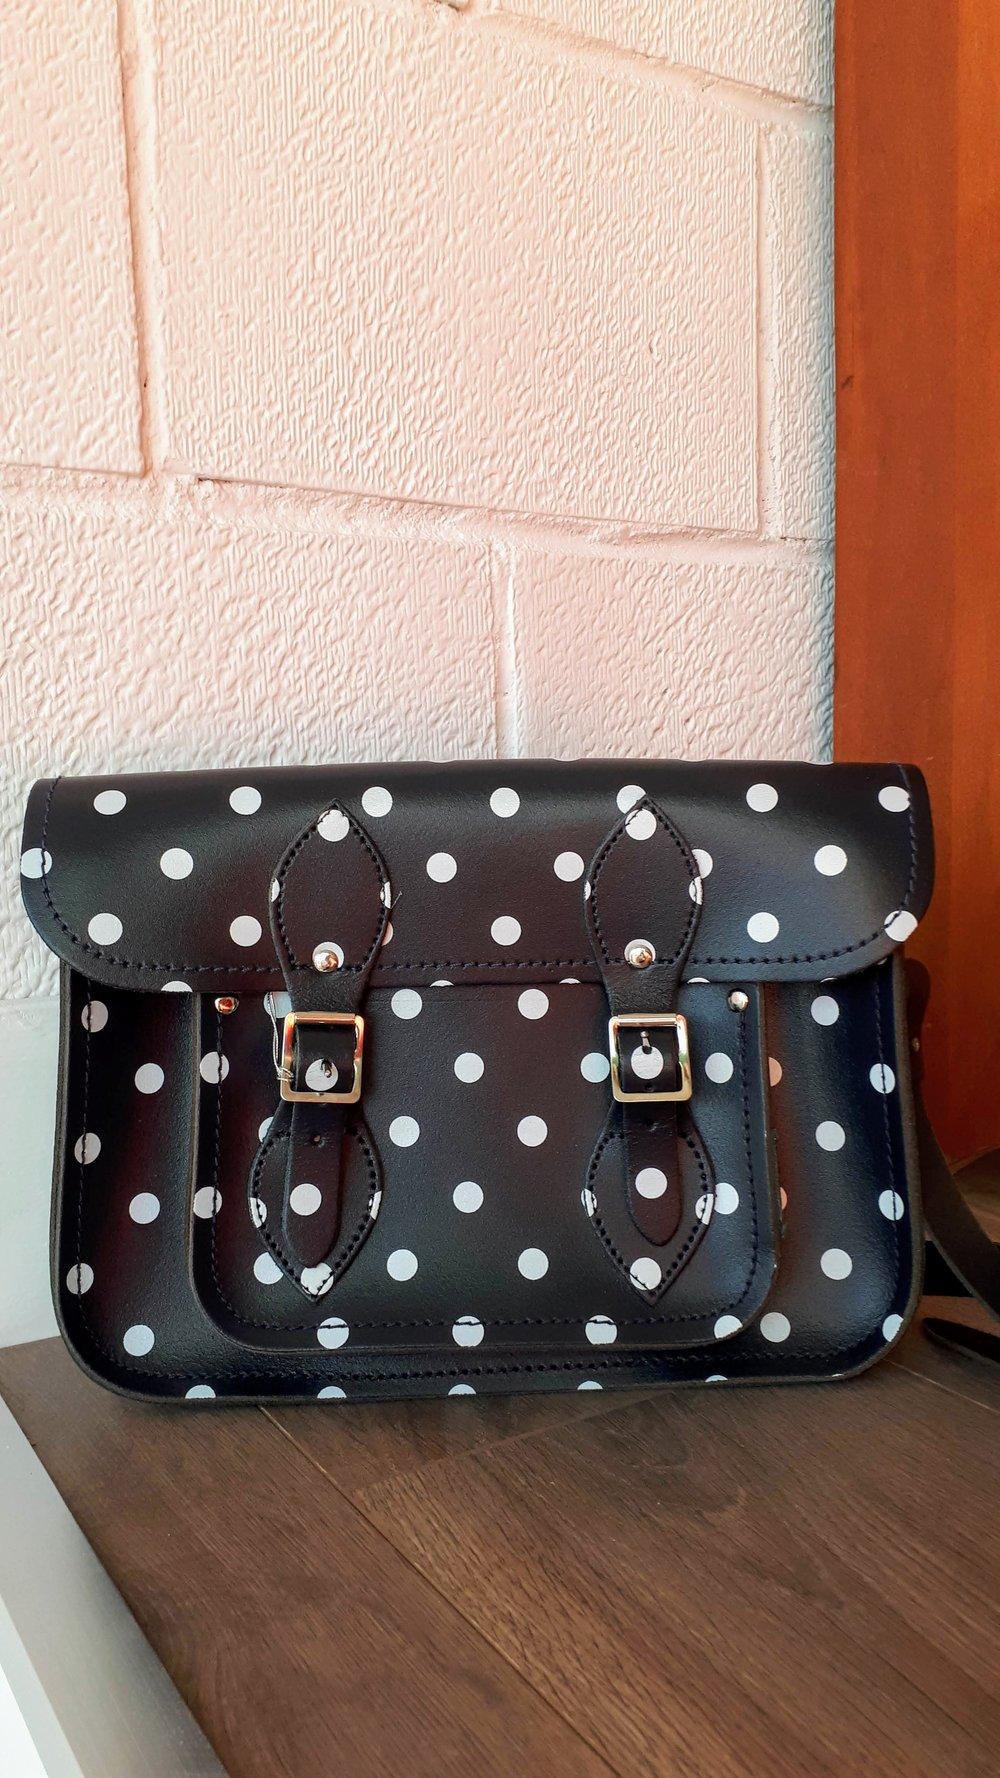 Zatchel satchel (NWT). $78